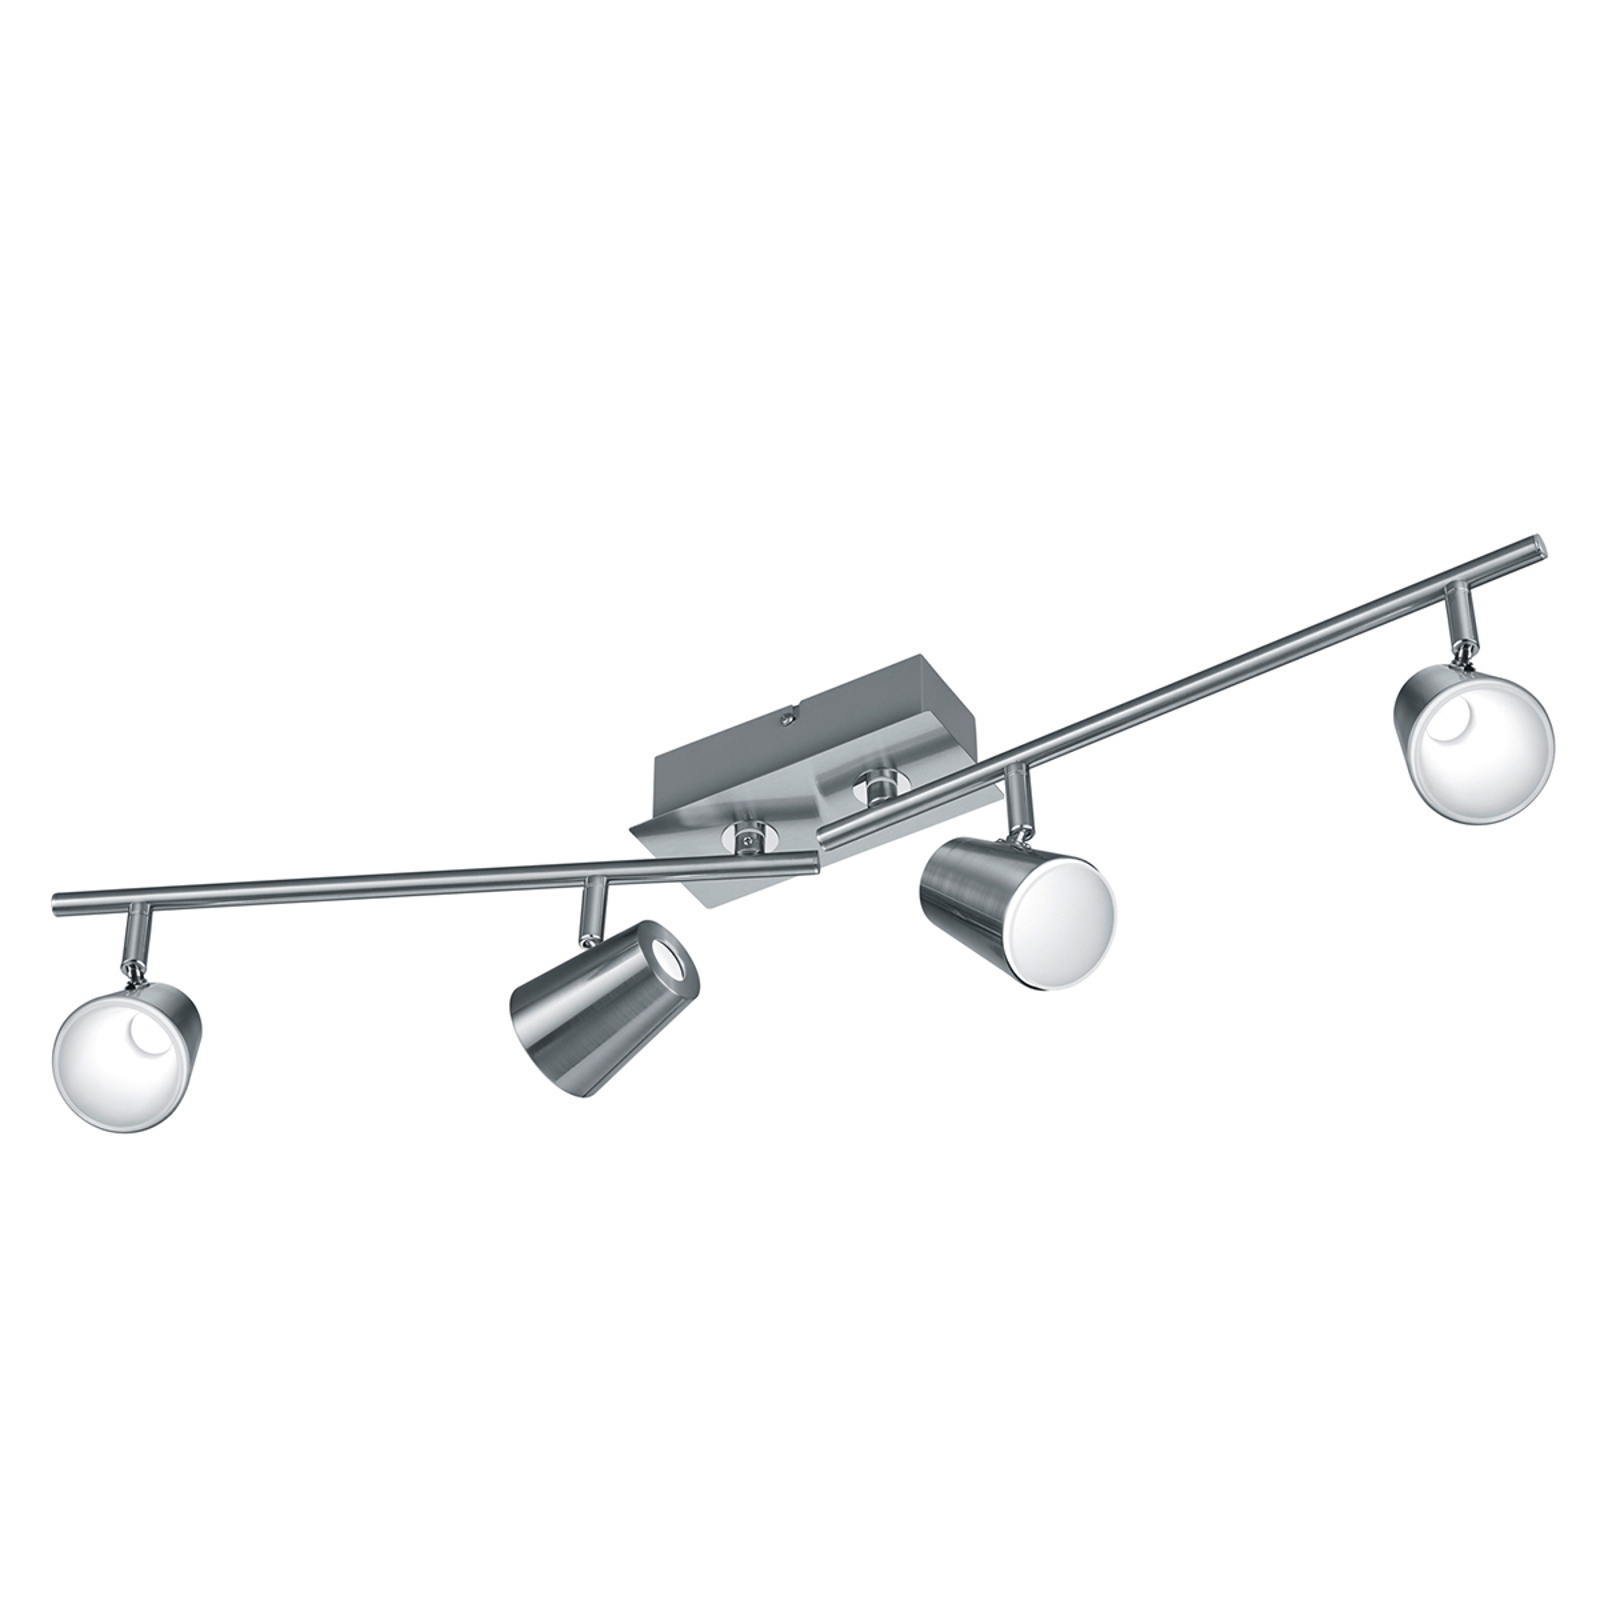 Moderni LED-kattokohdevalo Narcos 4-lamppuinen